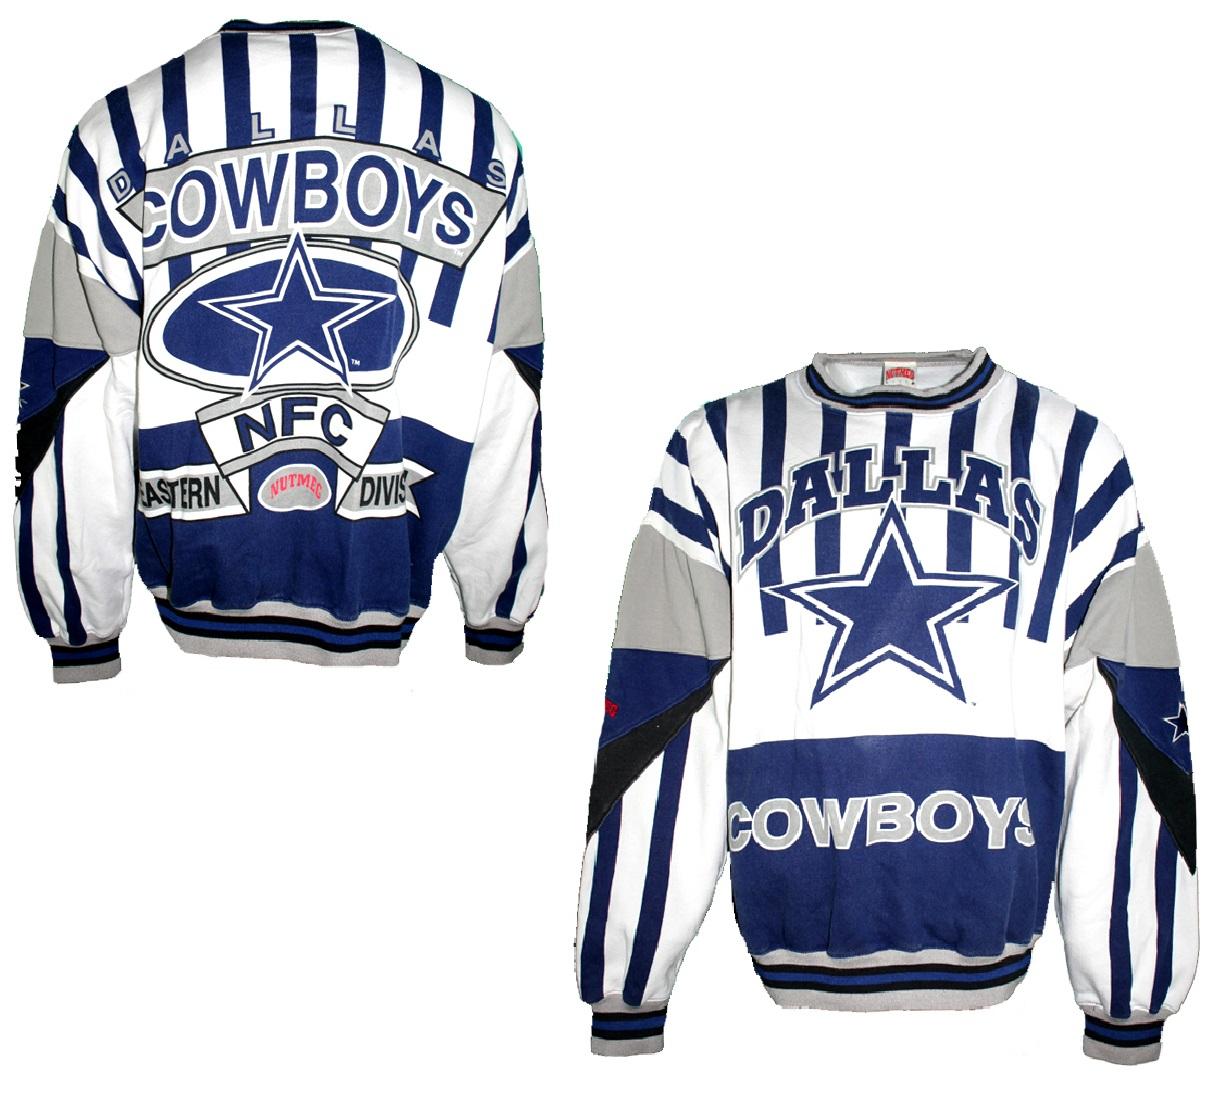 detailed look 1a330 3bfdd Nutmeg Dallas Cowboys Sweatshirt NFL American Football men's ...